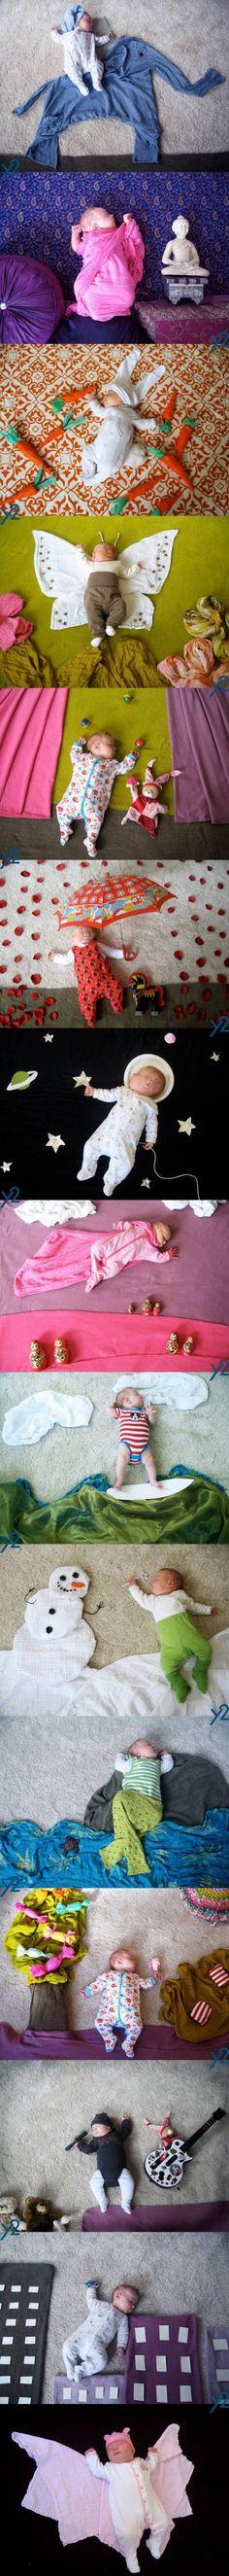 Finland mummy - Adele. The dream Of my baby.